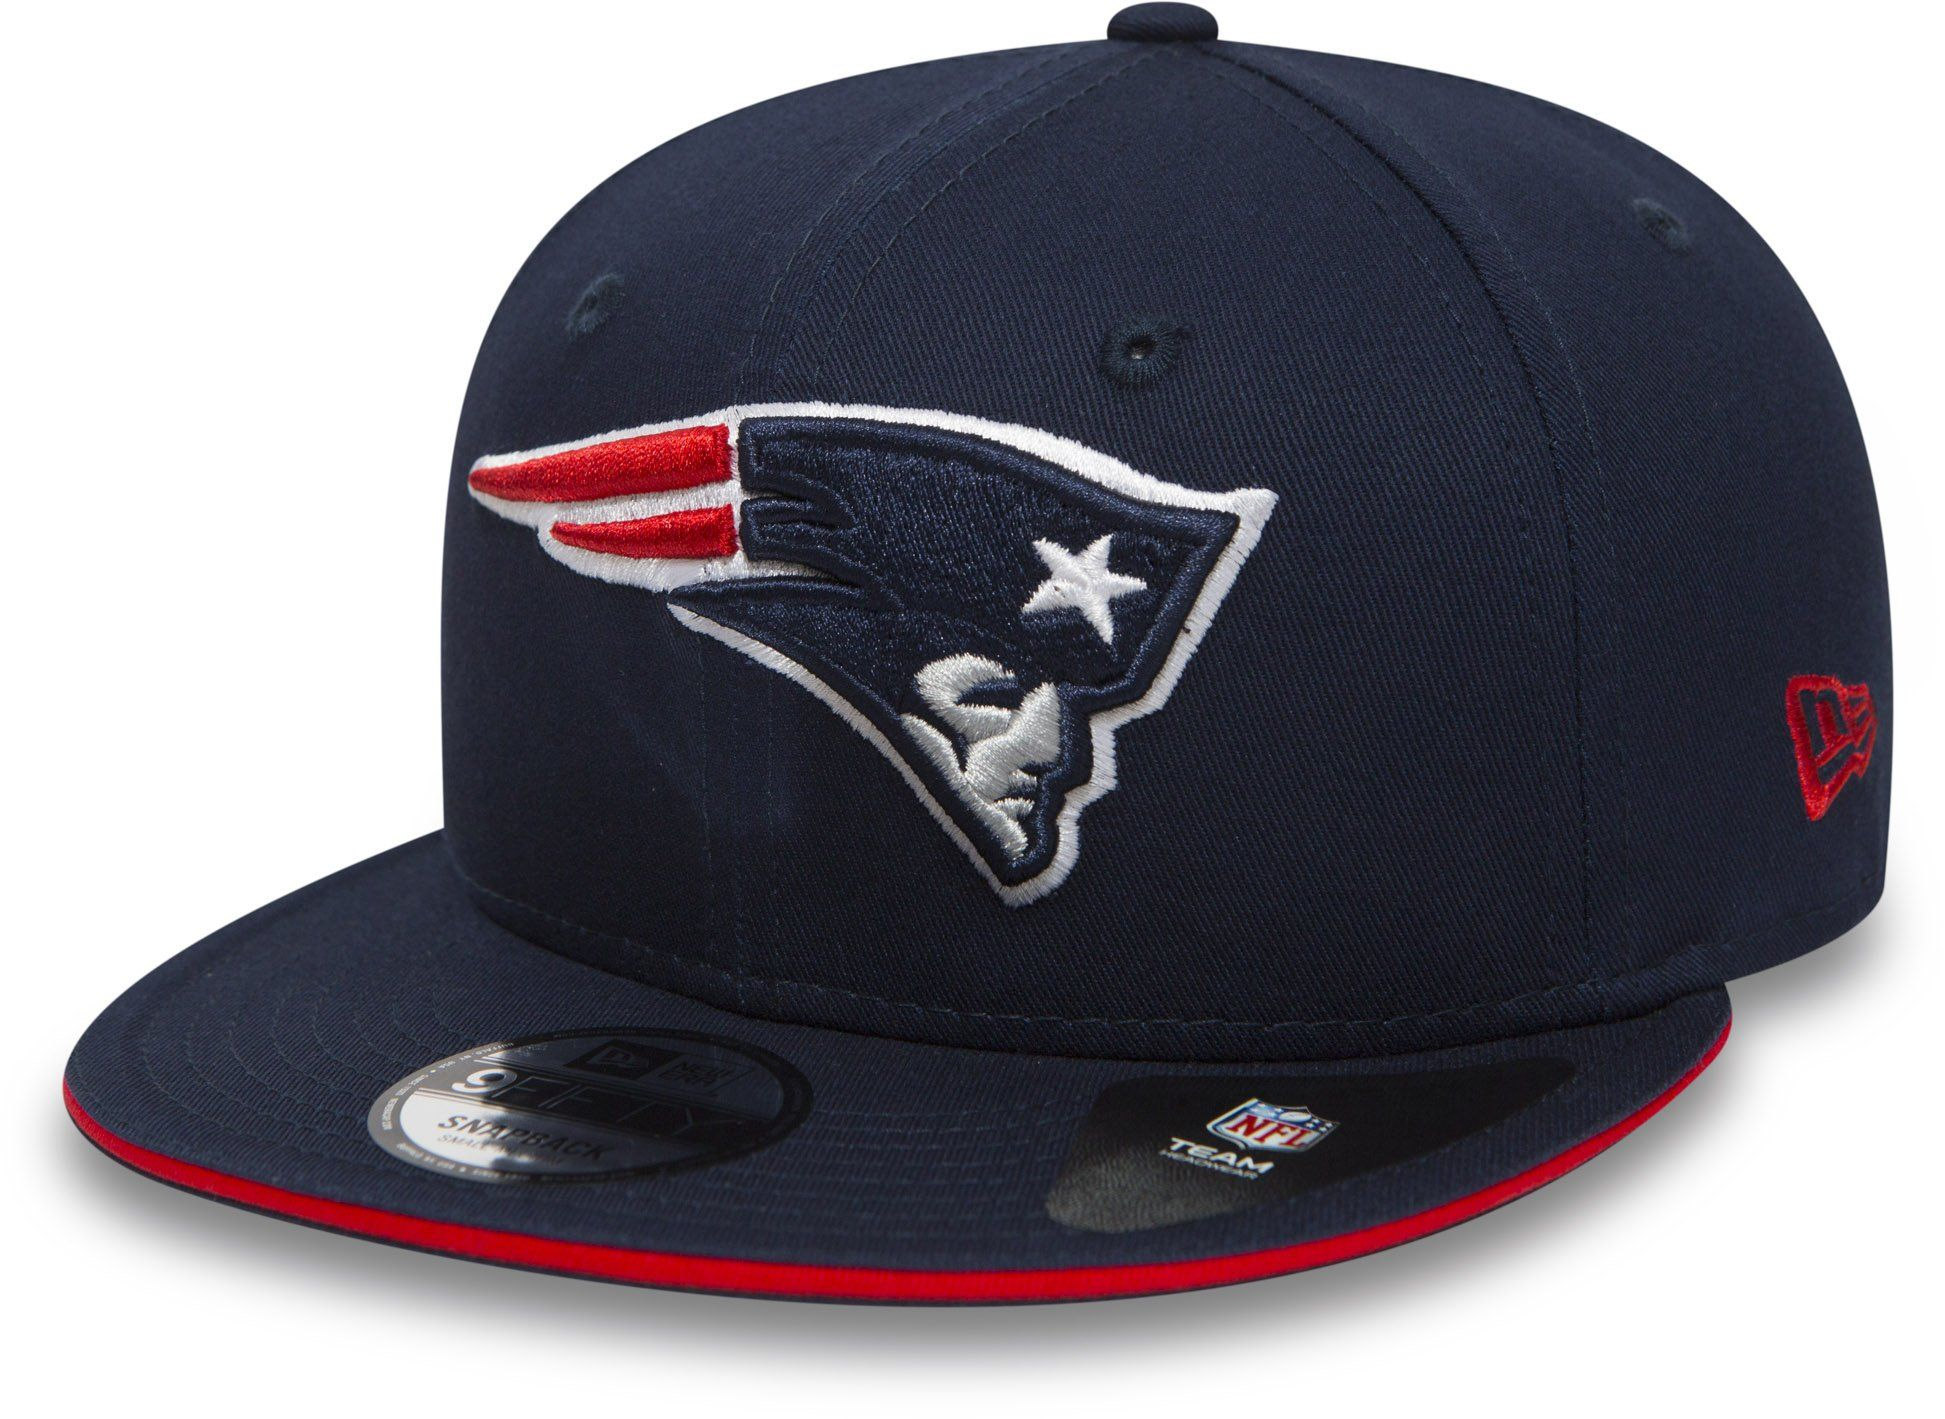 quality design 04784 d2bf0 New England Patriots New Era 950 Sandwhich Visor Team Snapback Cap –  lovemycap